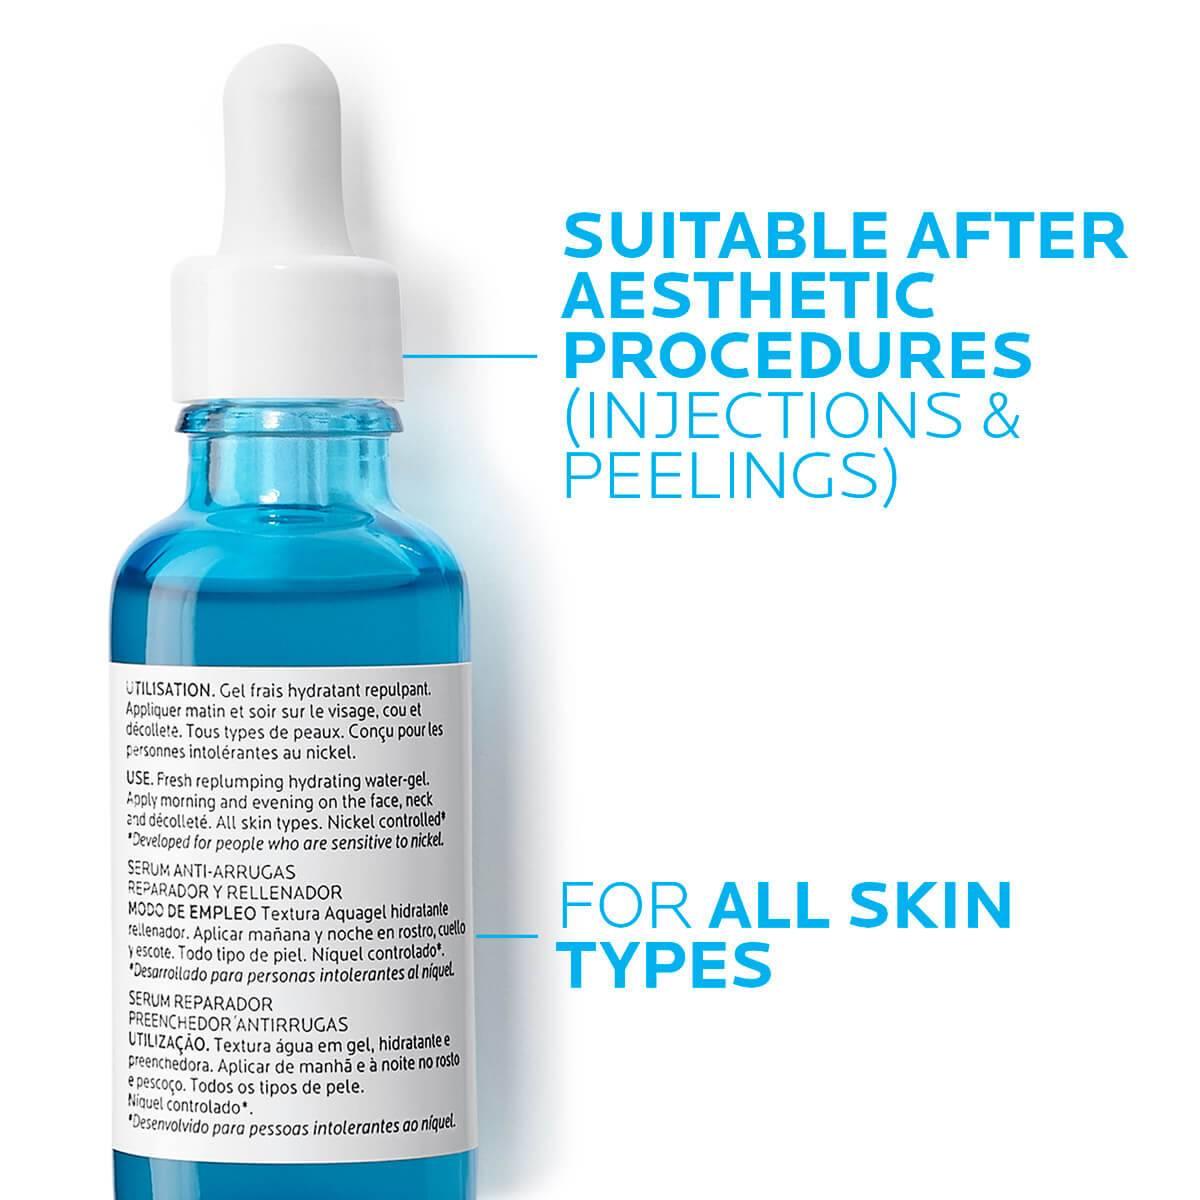 La Roche Posay ProductPage Anti Aging Hyalu B5 Serum 30ml 333787558362